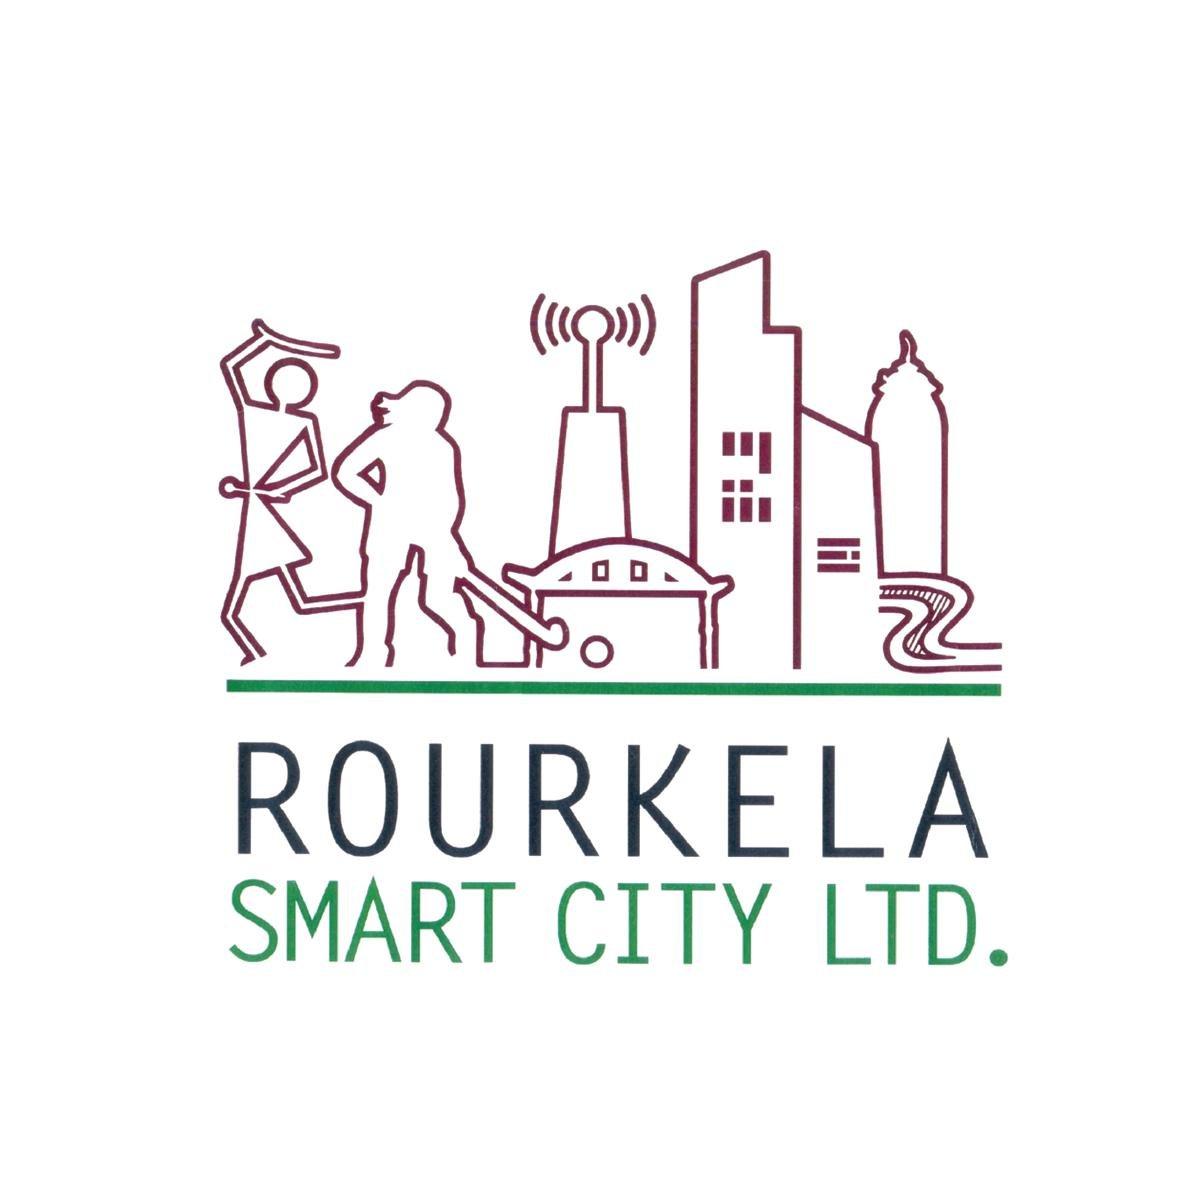 rourkela-smart-city-limited